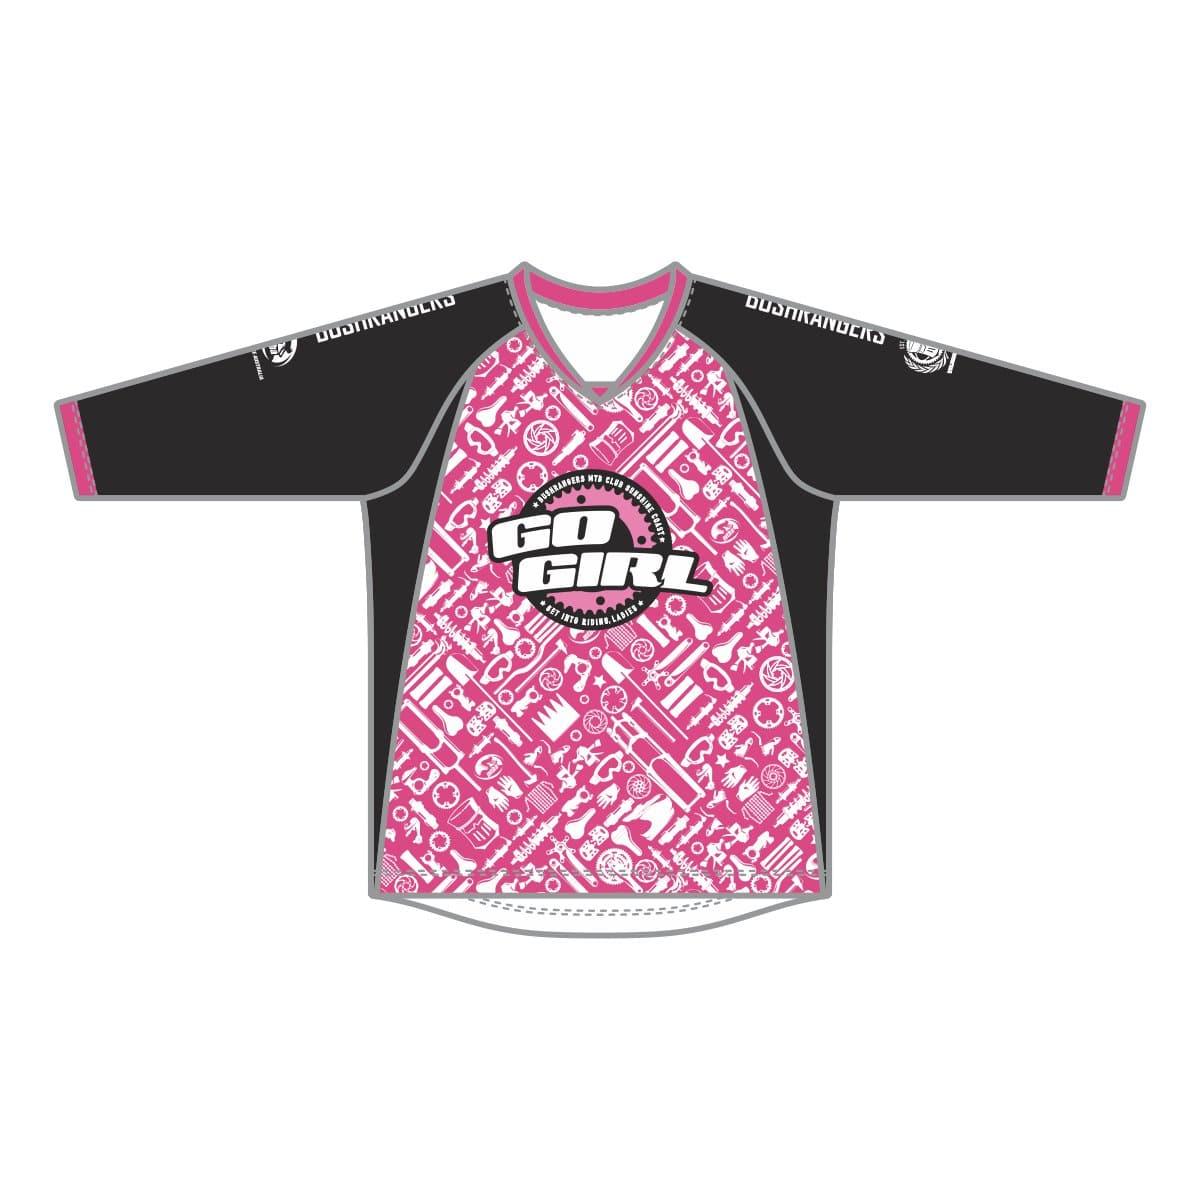 638028643 Bushrangers MTB Youth 3 4 Sleeve Enduro Jersey - Pink Black ...